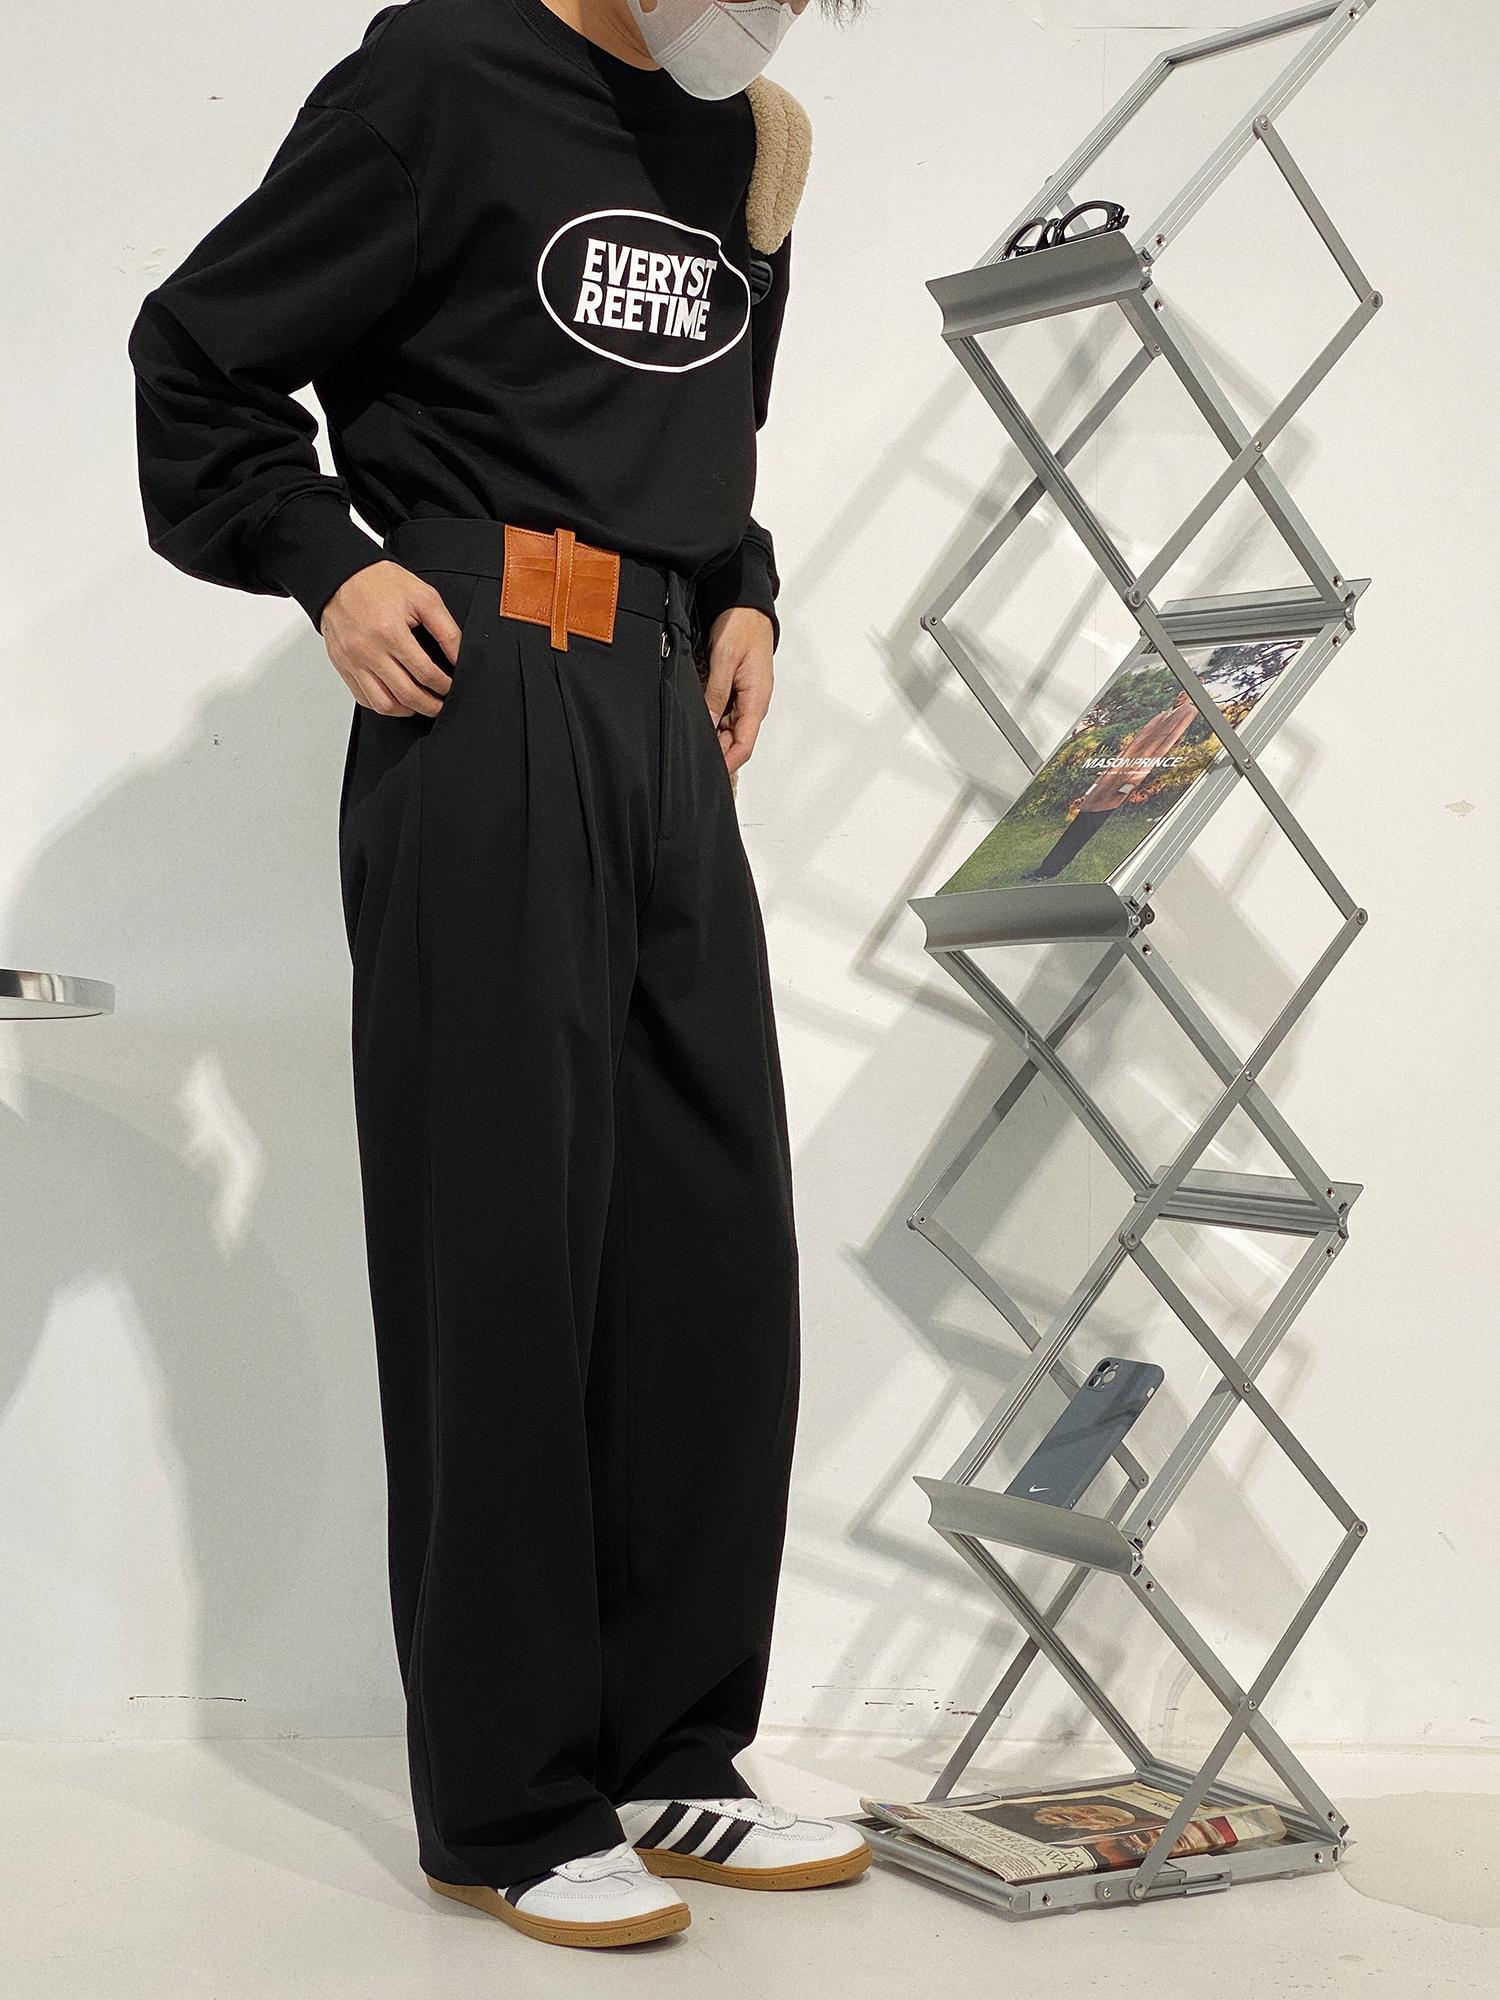 19studio 韩版小众设计直筒西裤垂坠感显瘦阔腿拖地宽松休闲裤男